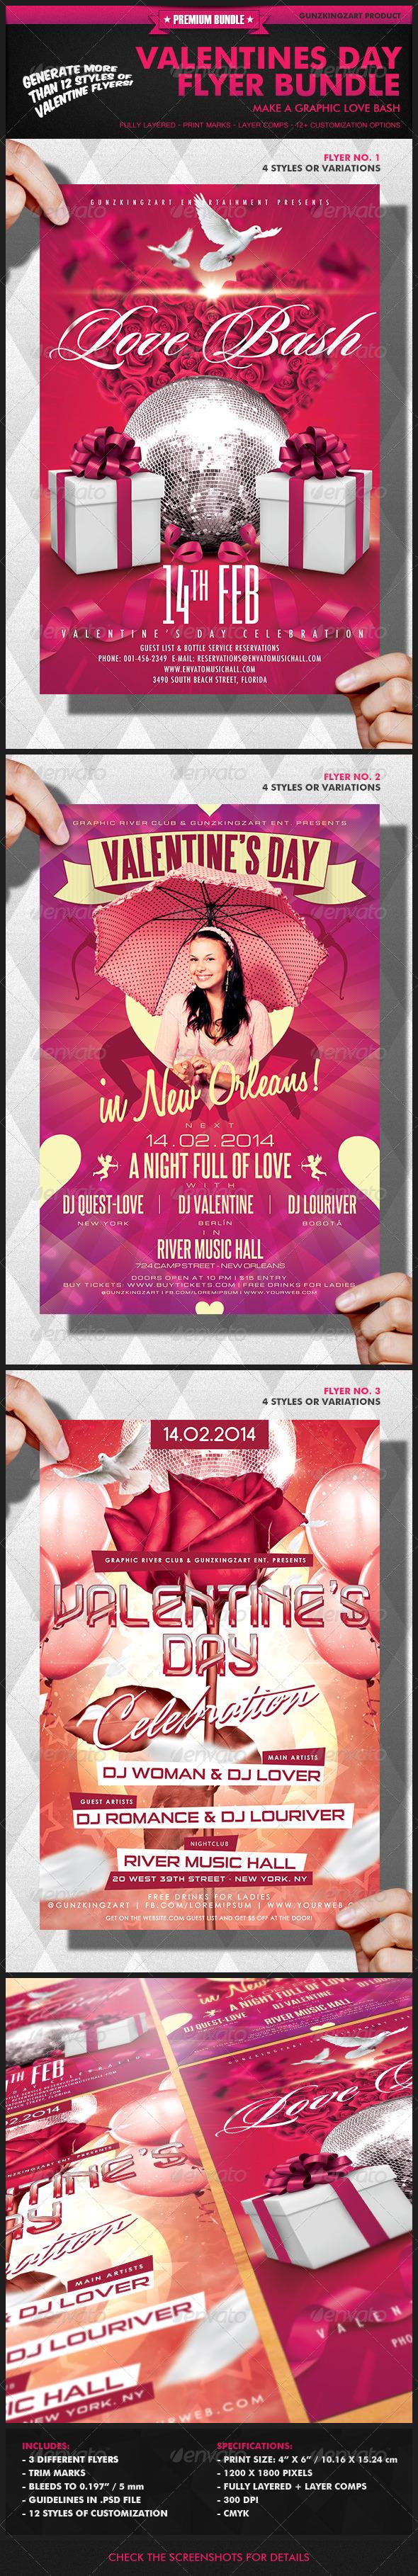 GraphicRiver Valentines Day Flyer Bundle 6619790